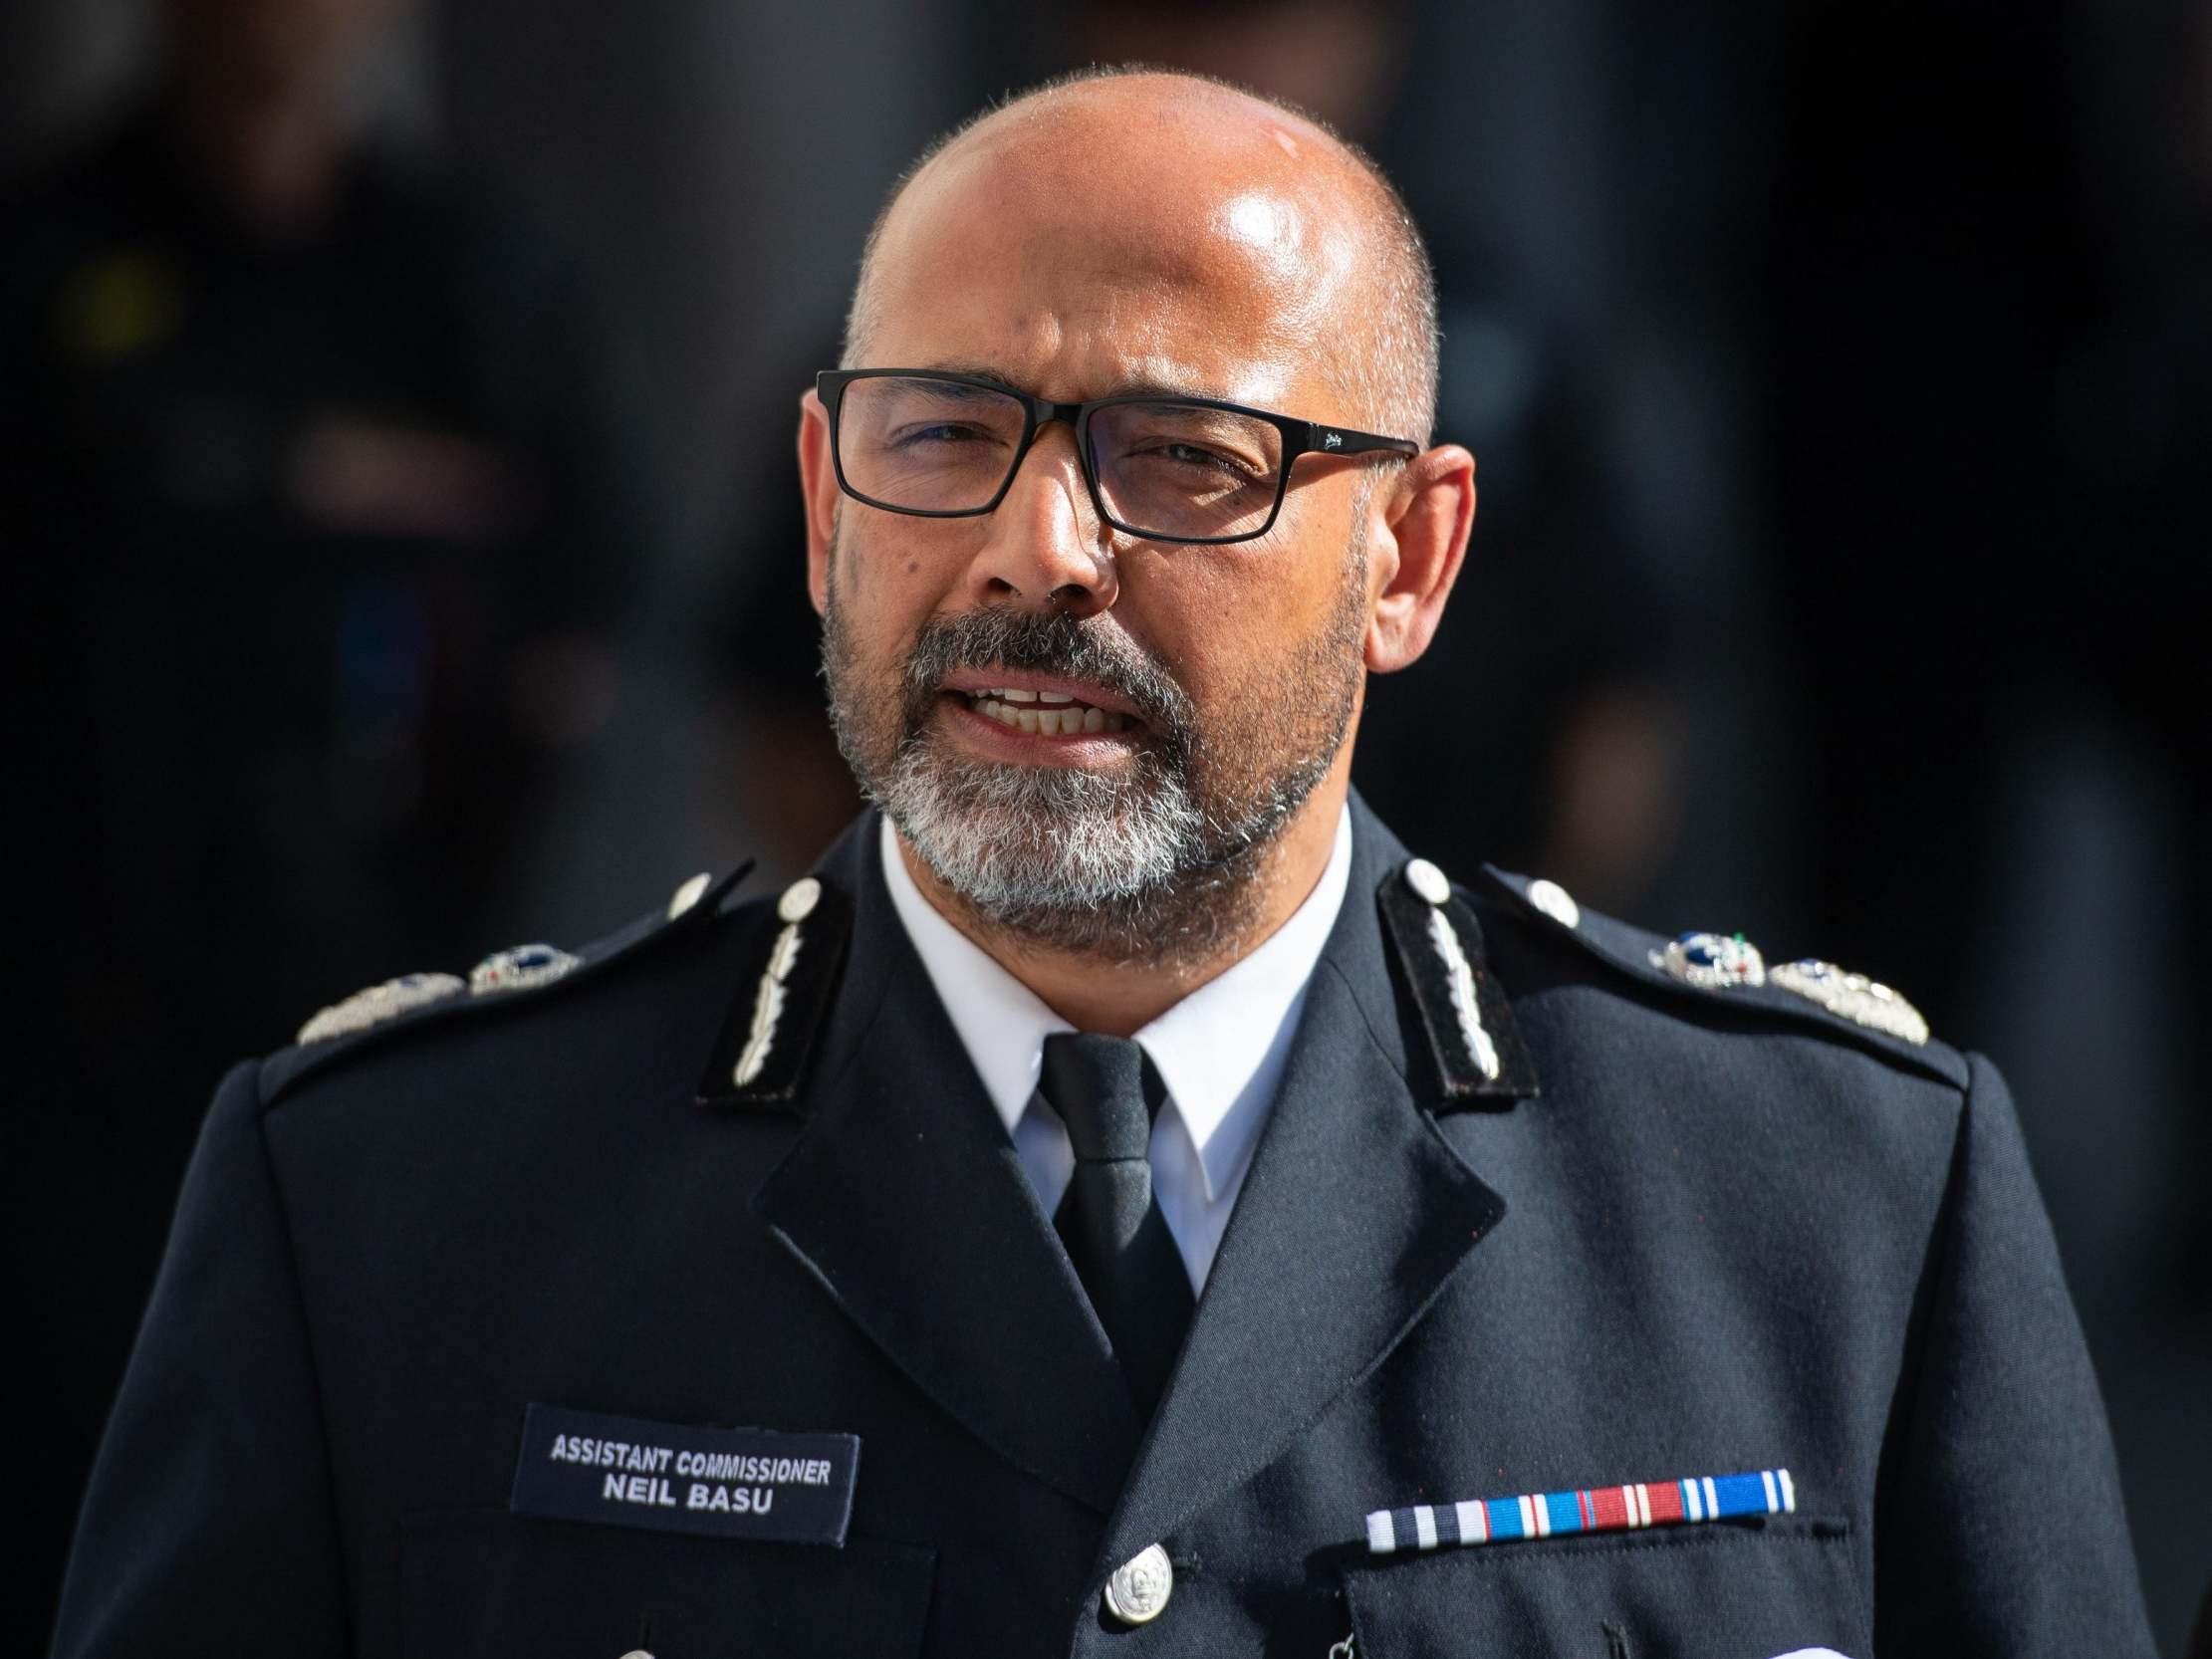 Counterterror police chief denies undermining press freedom over Sir Kim Darroch leaks